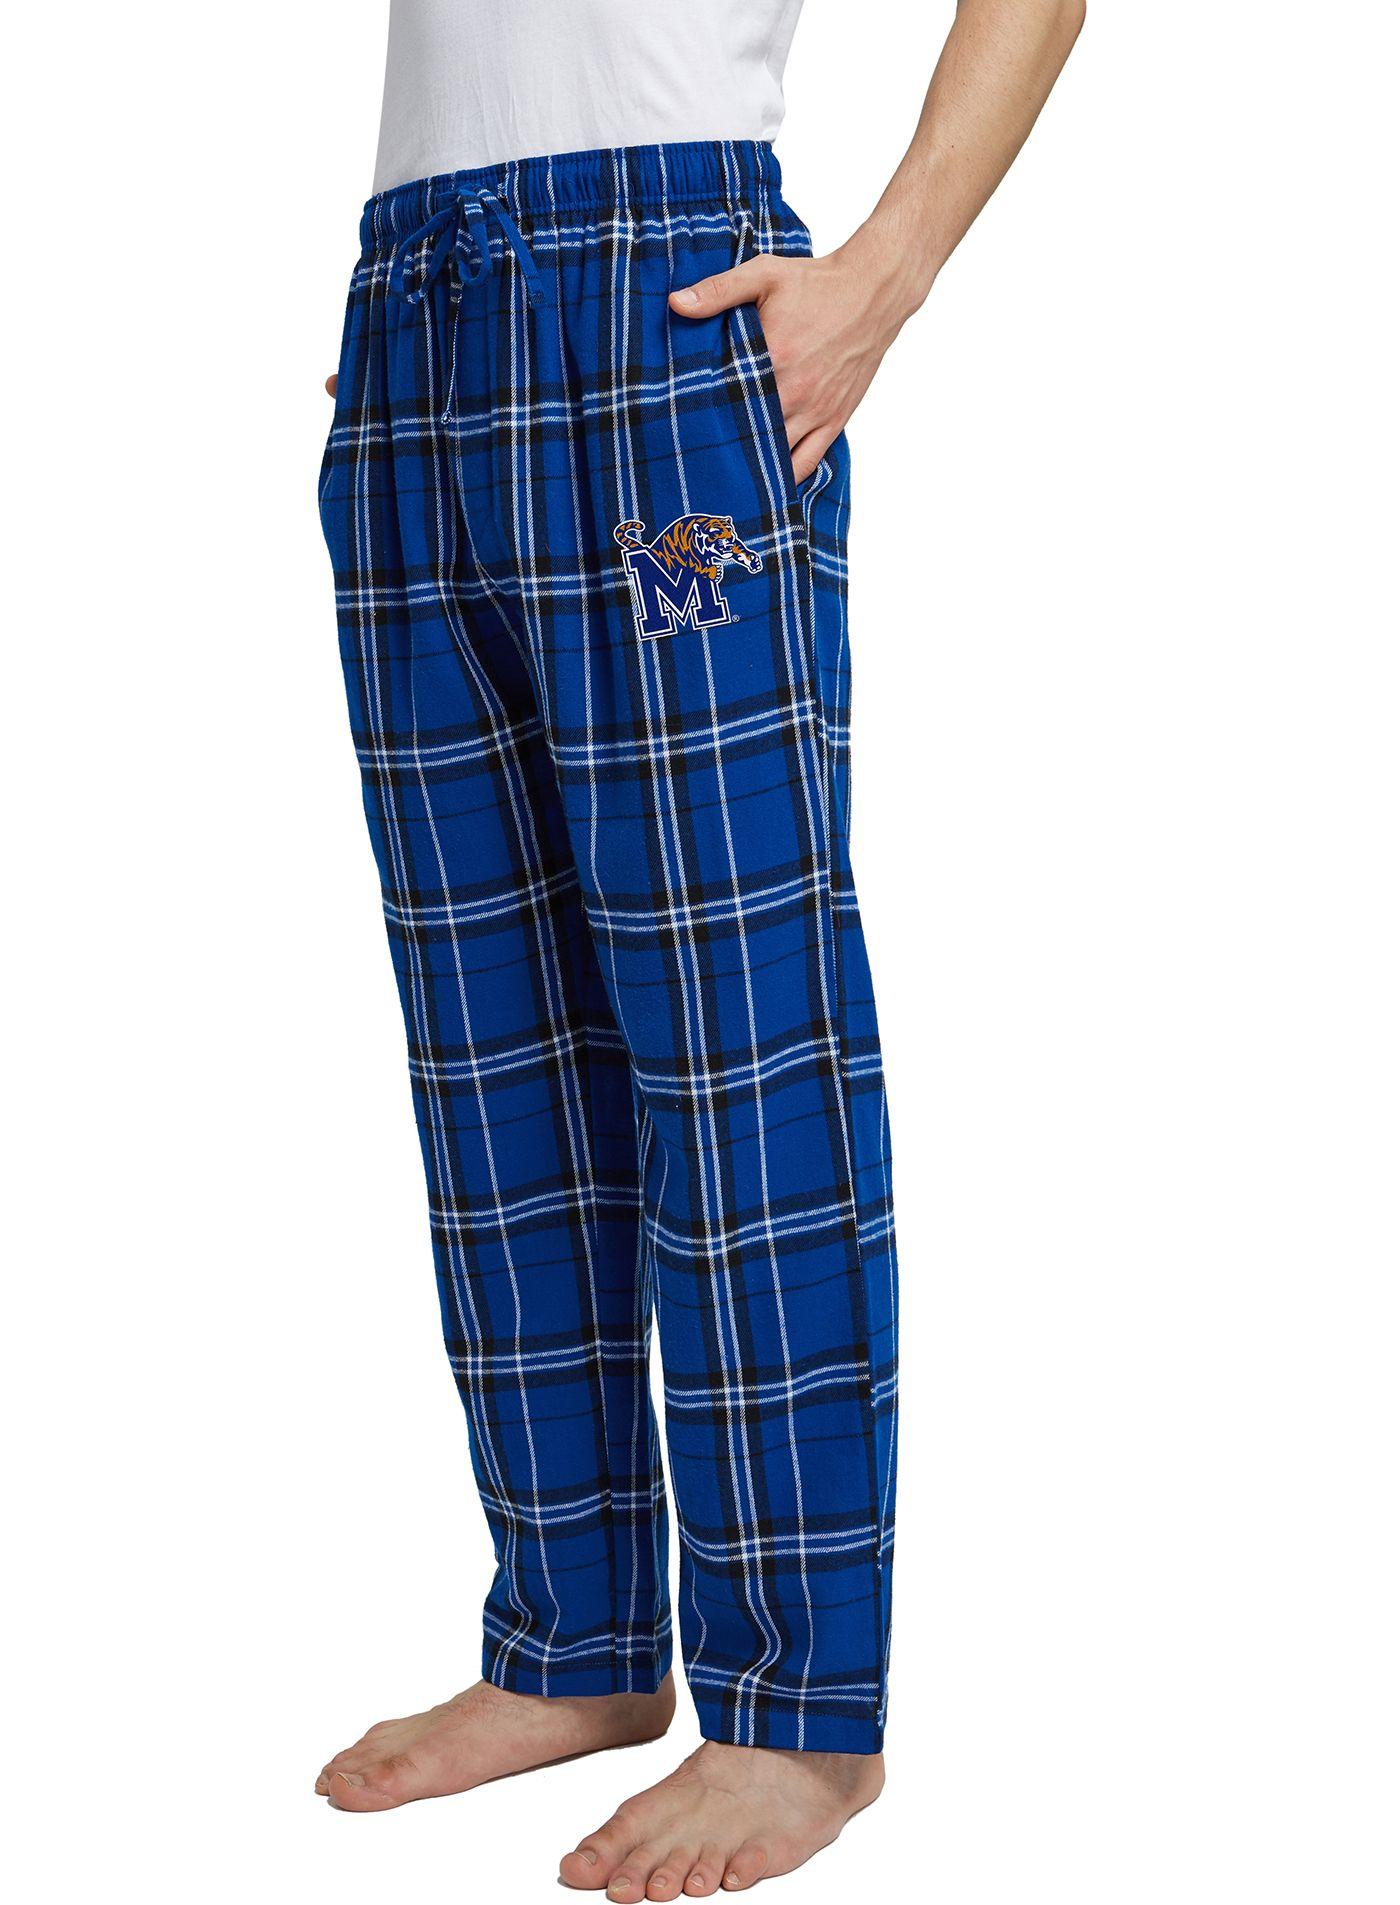 Concepts Sport Men's Memphis Tigers Blue/Grey Hillstone Flannel Sleep Pants